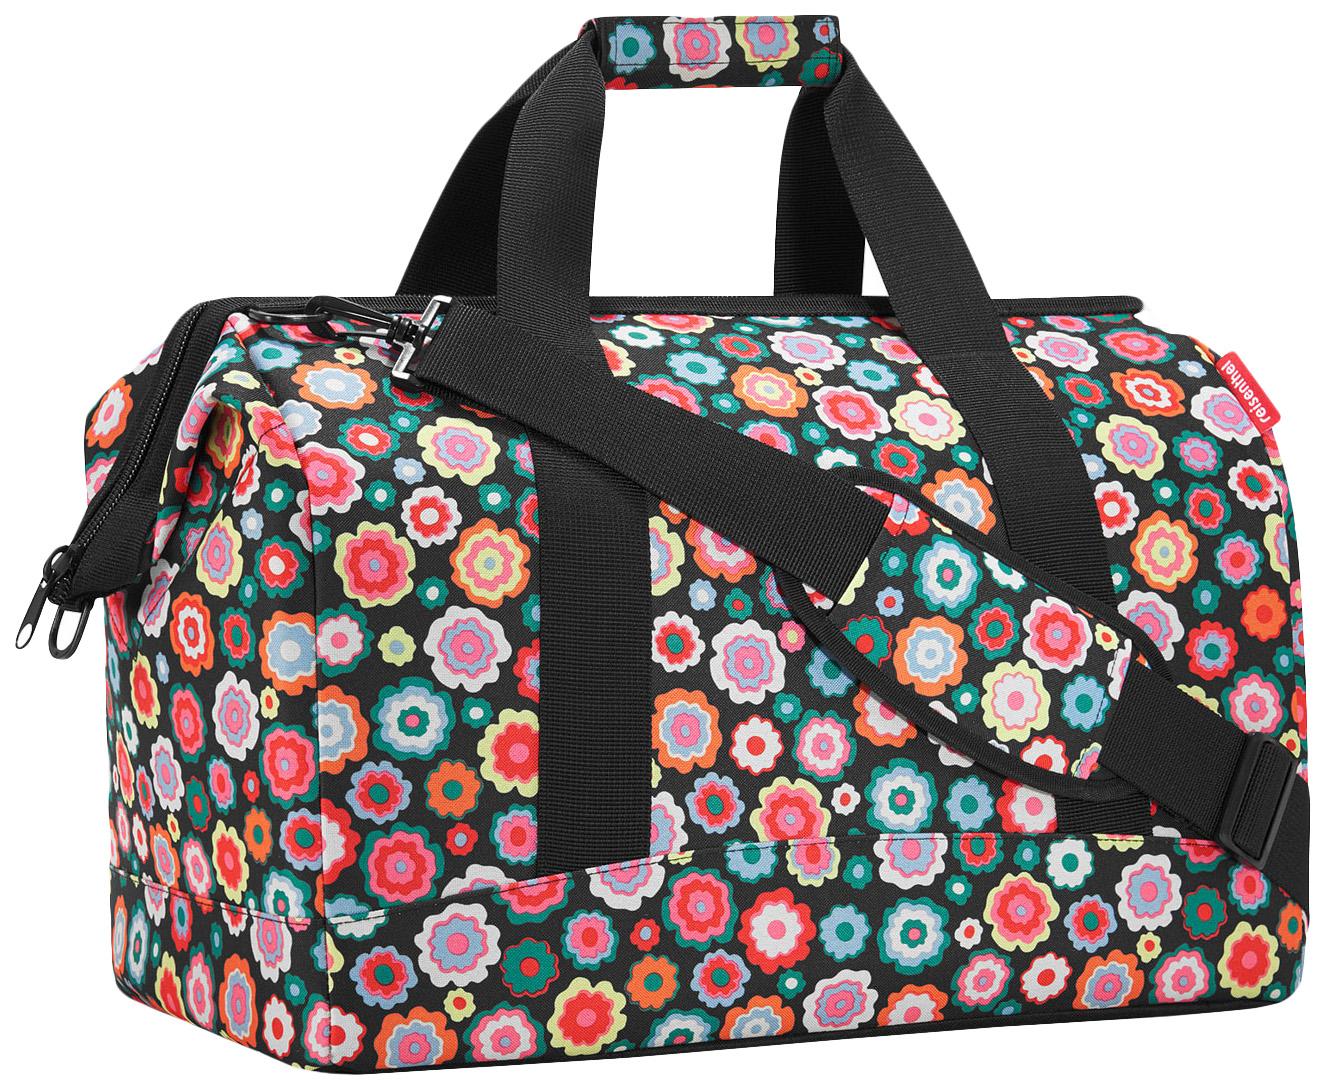 Дорожная сумка Reisenthel Allrounder Happy Flowers 43 x 21 x 53 фото